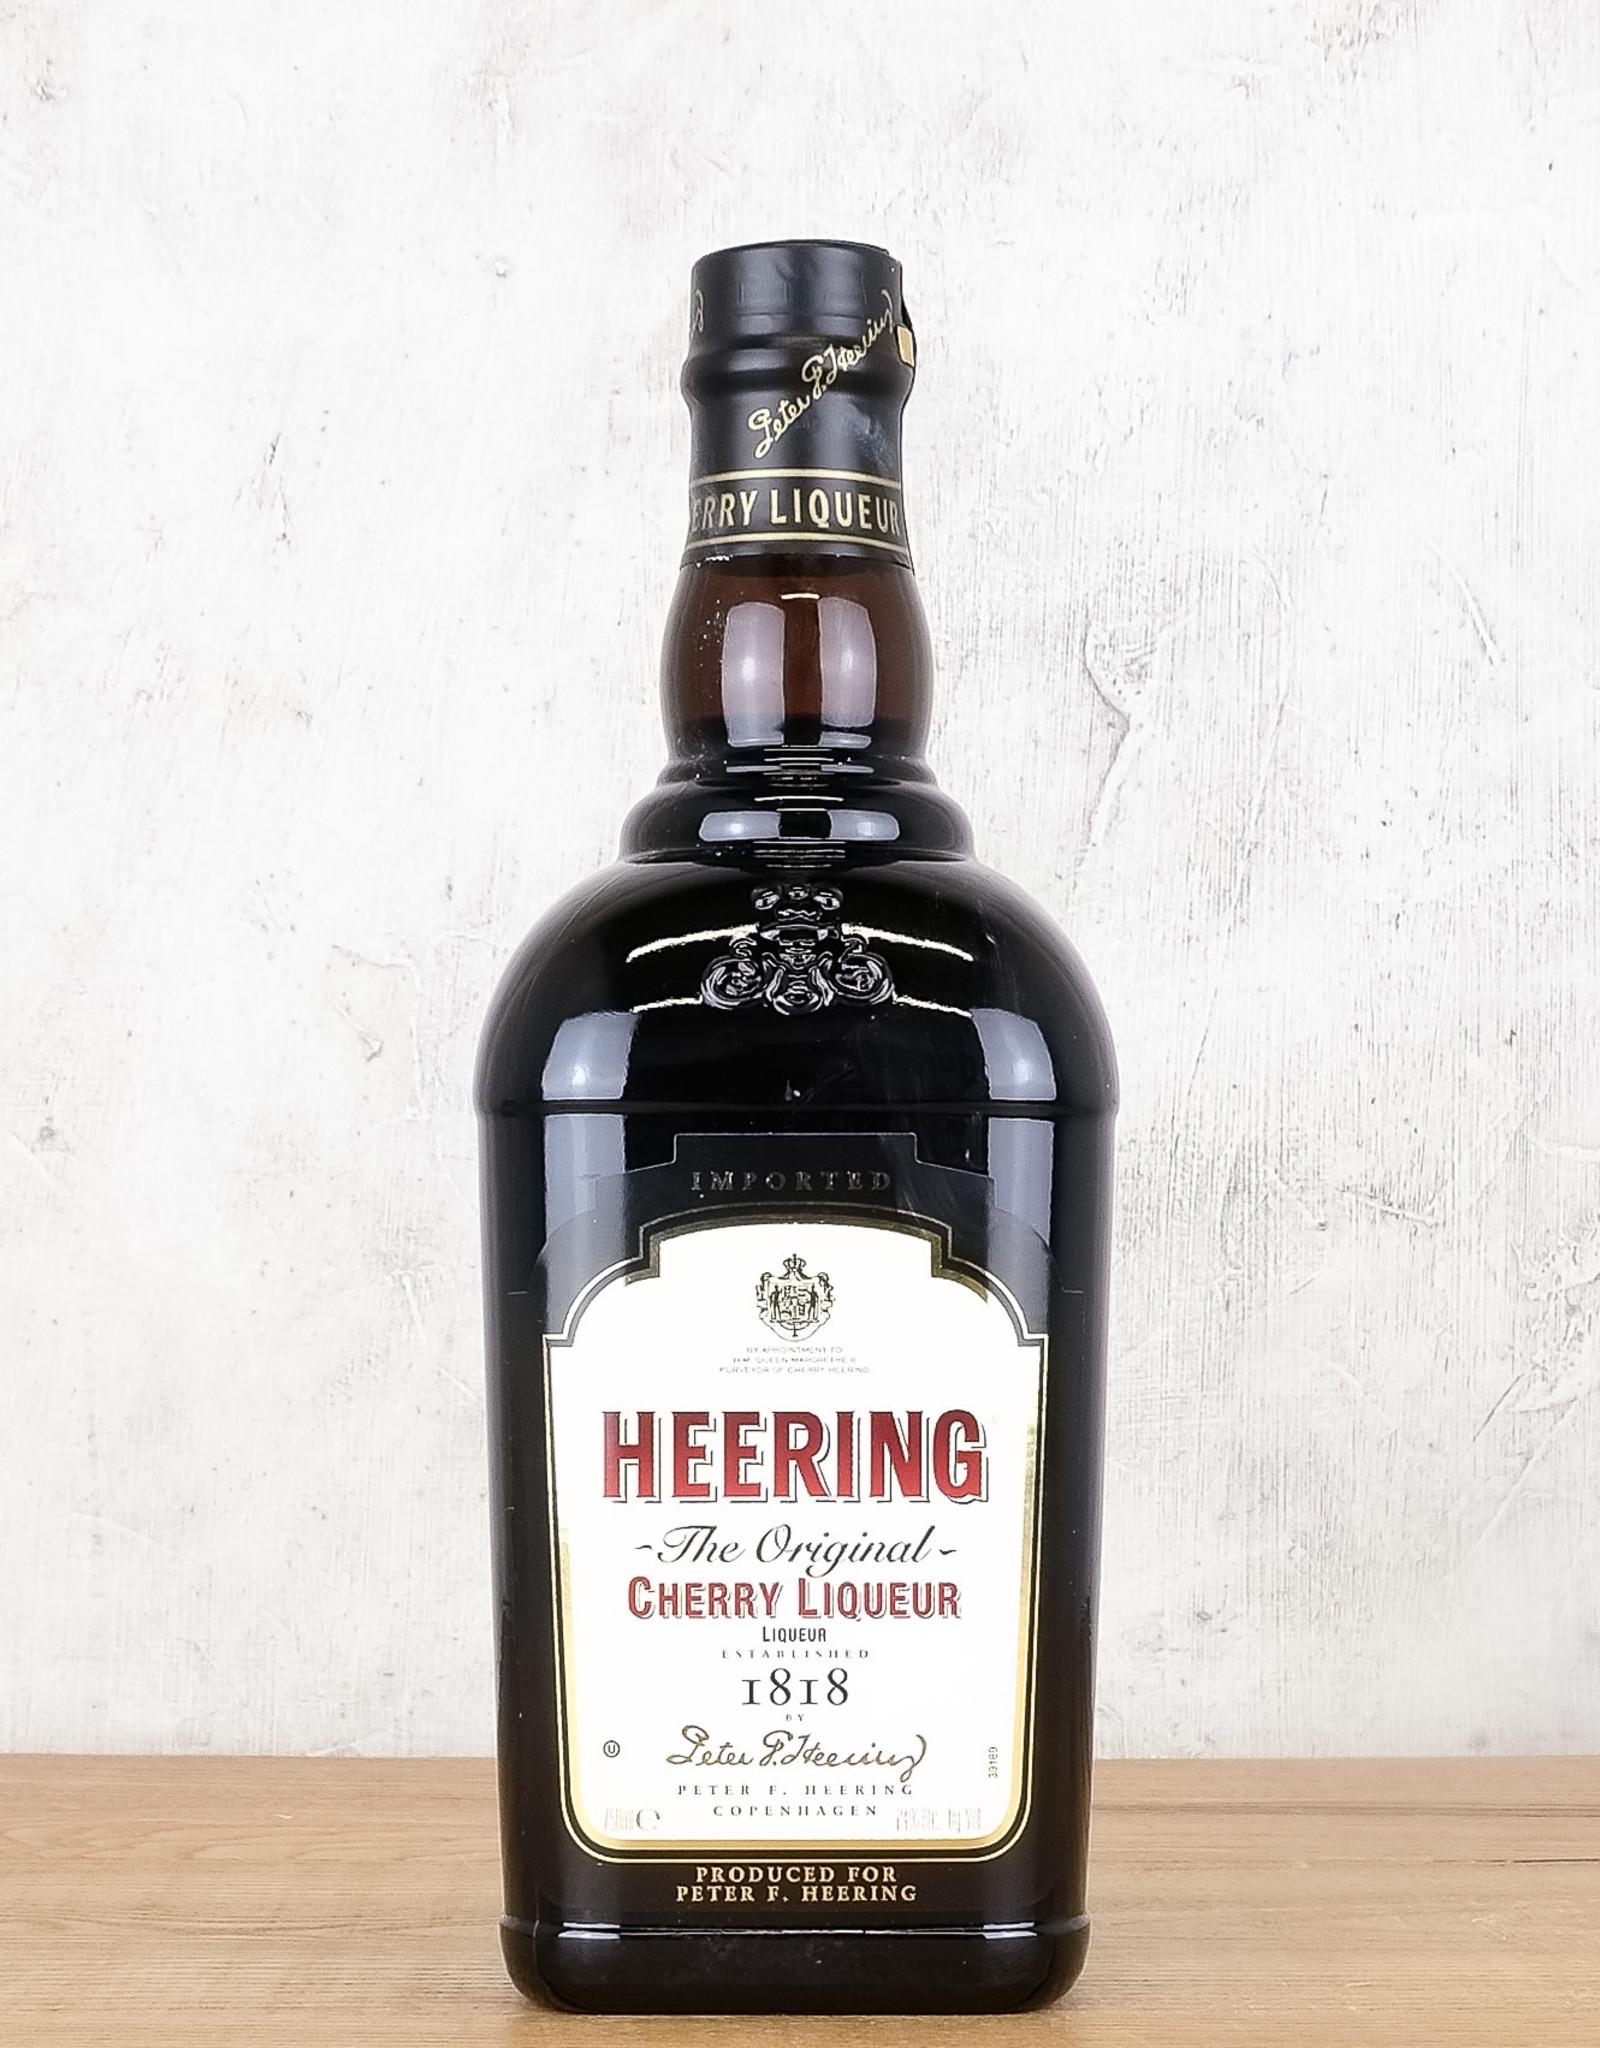 Heering Cherry Liquor